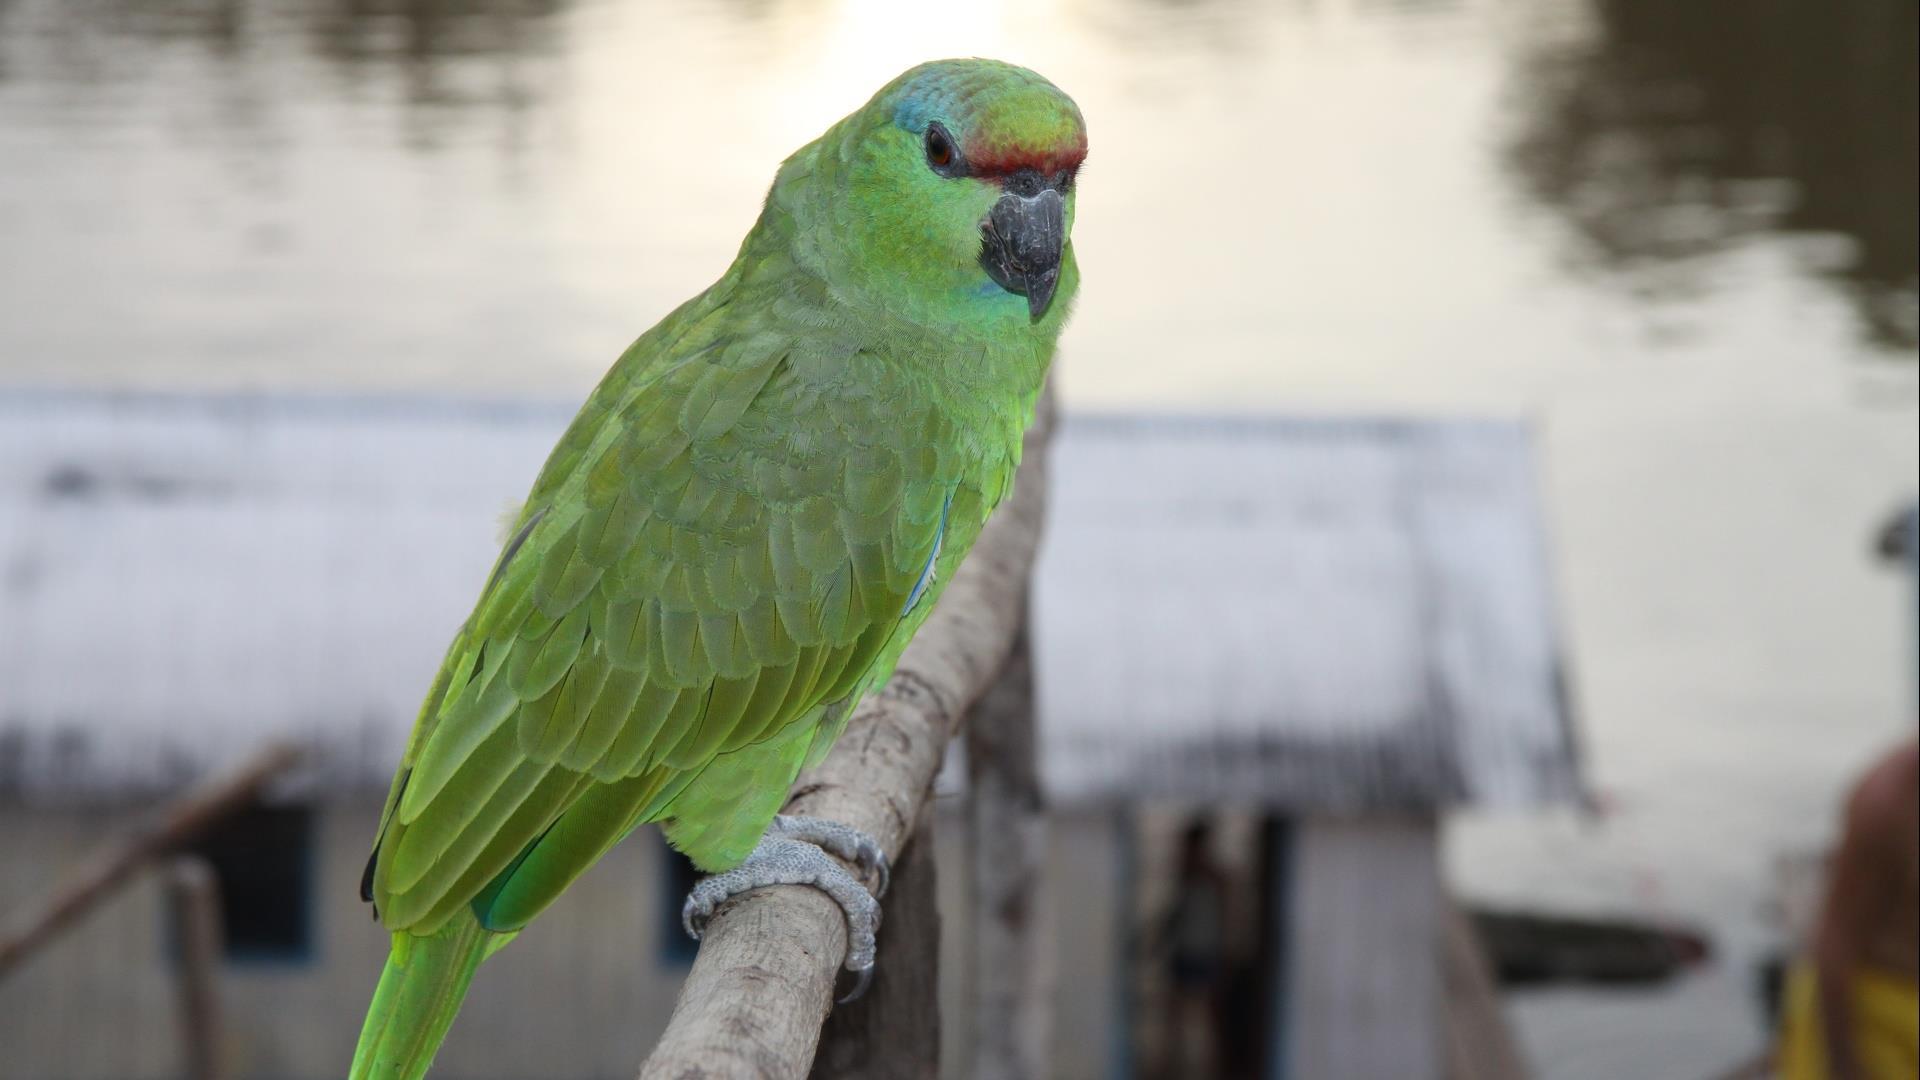 Brasilien Amazonas: 3 Tage Reisebaustein - Juma Amazon Lodge Arara Paket